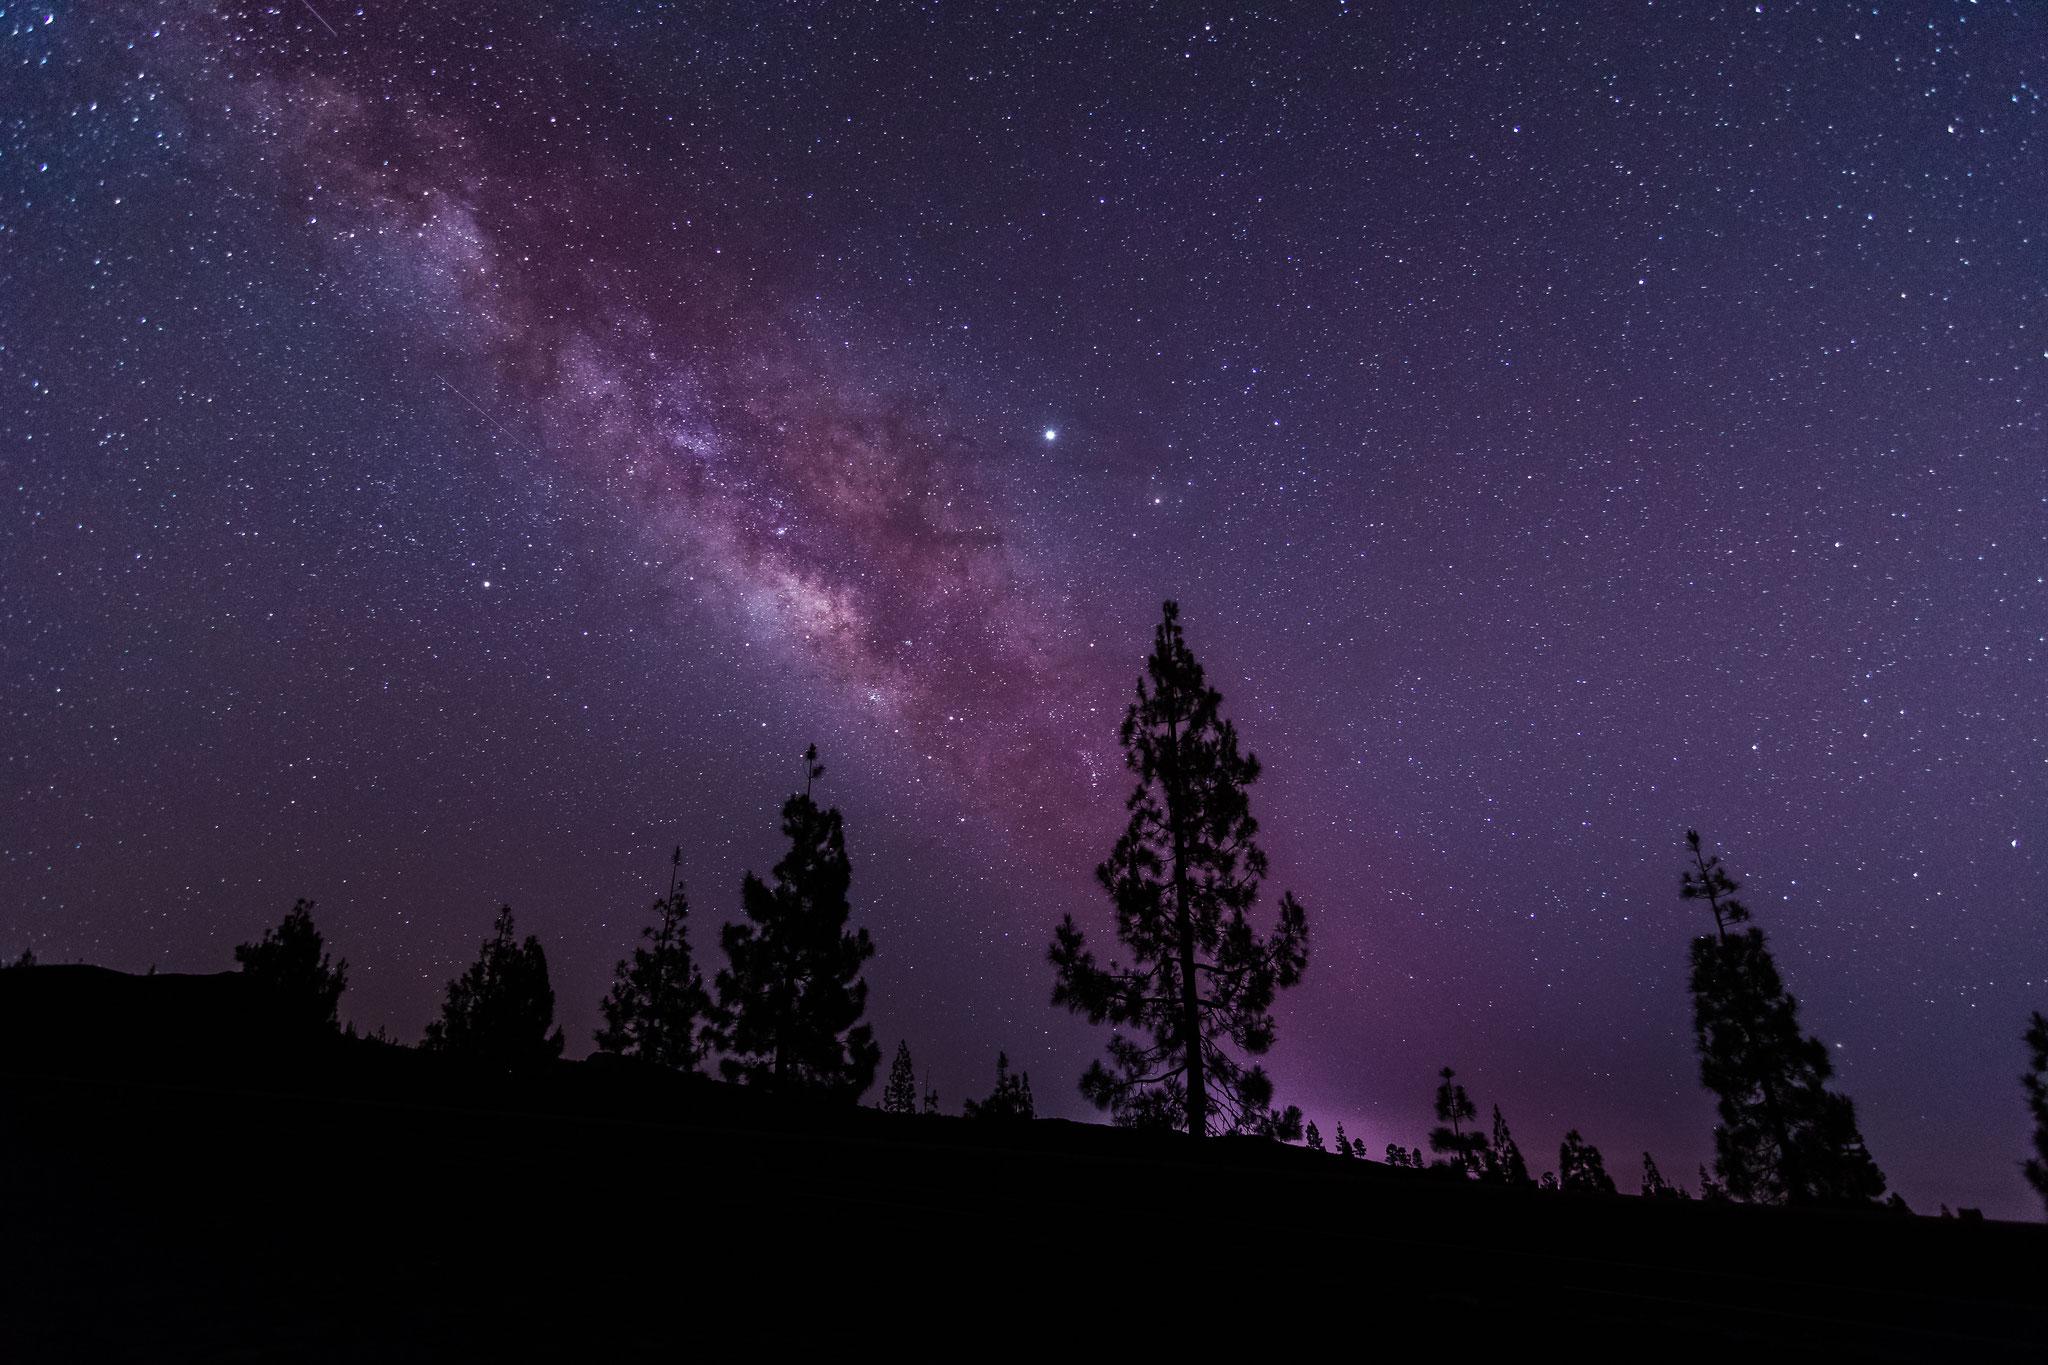 Milky Way©Udo Stoeter